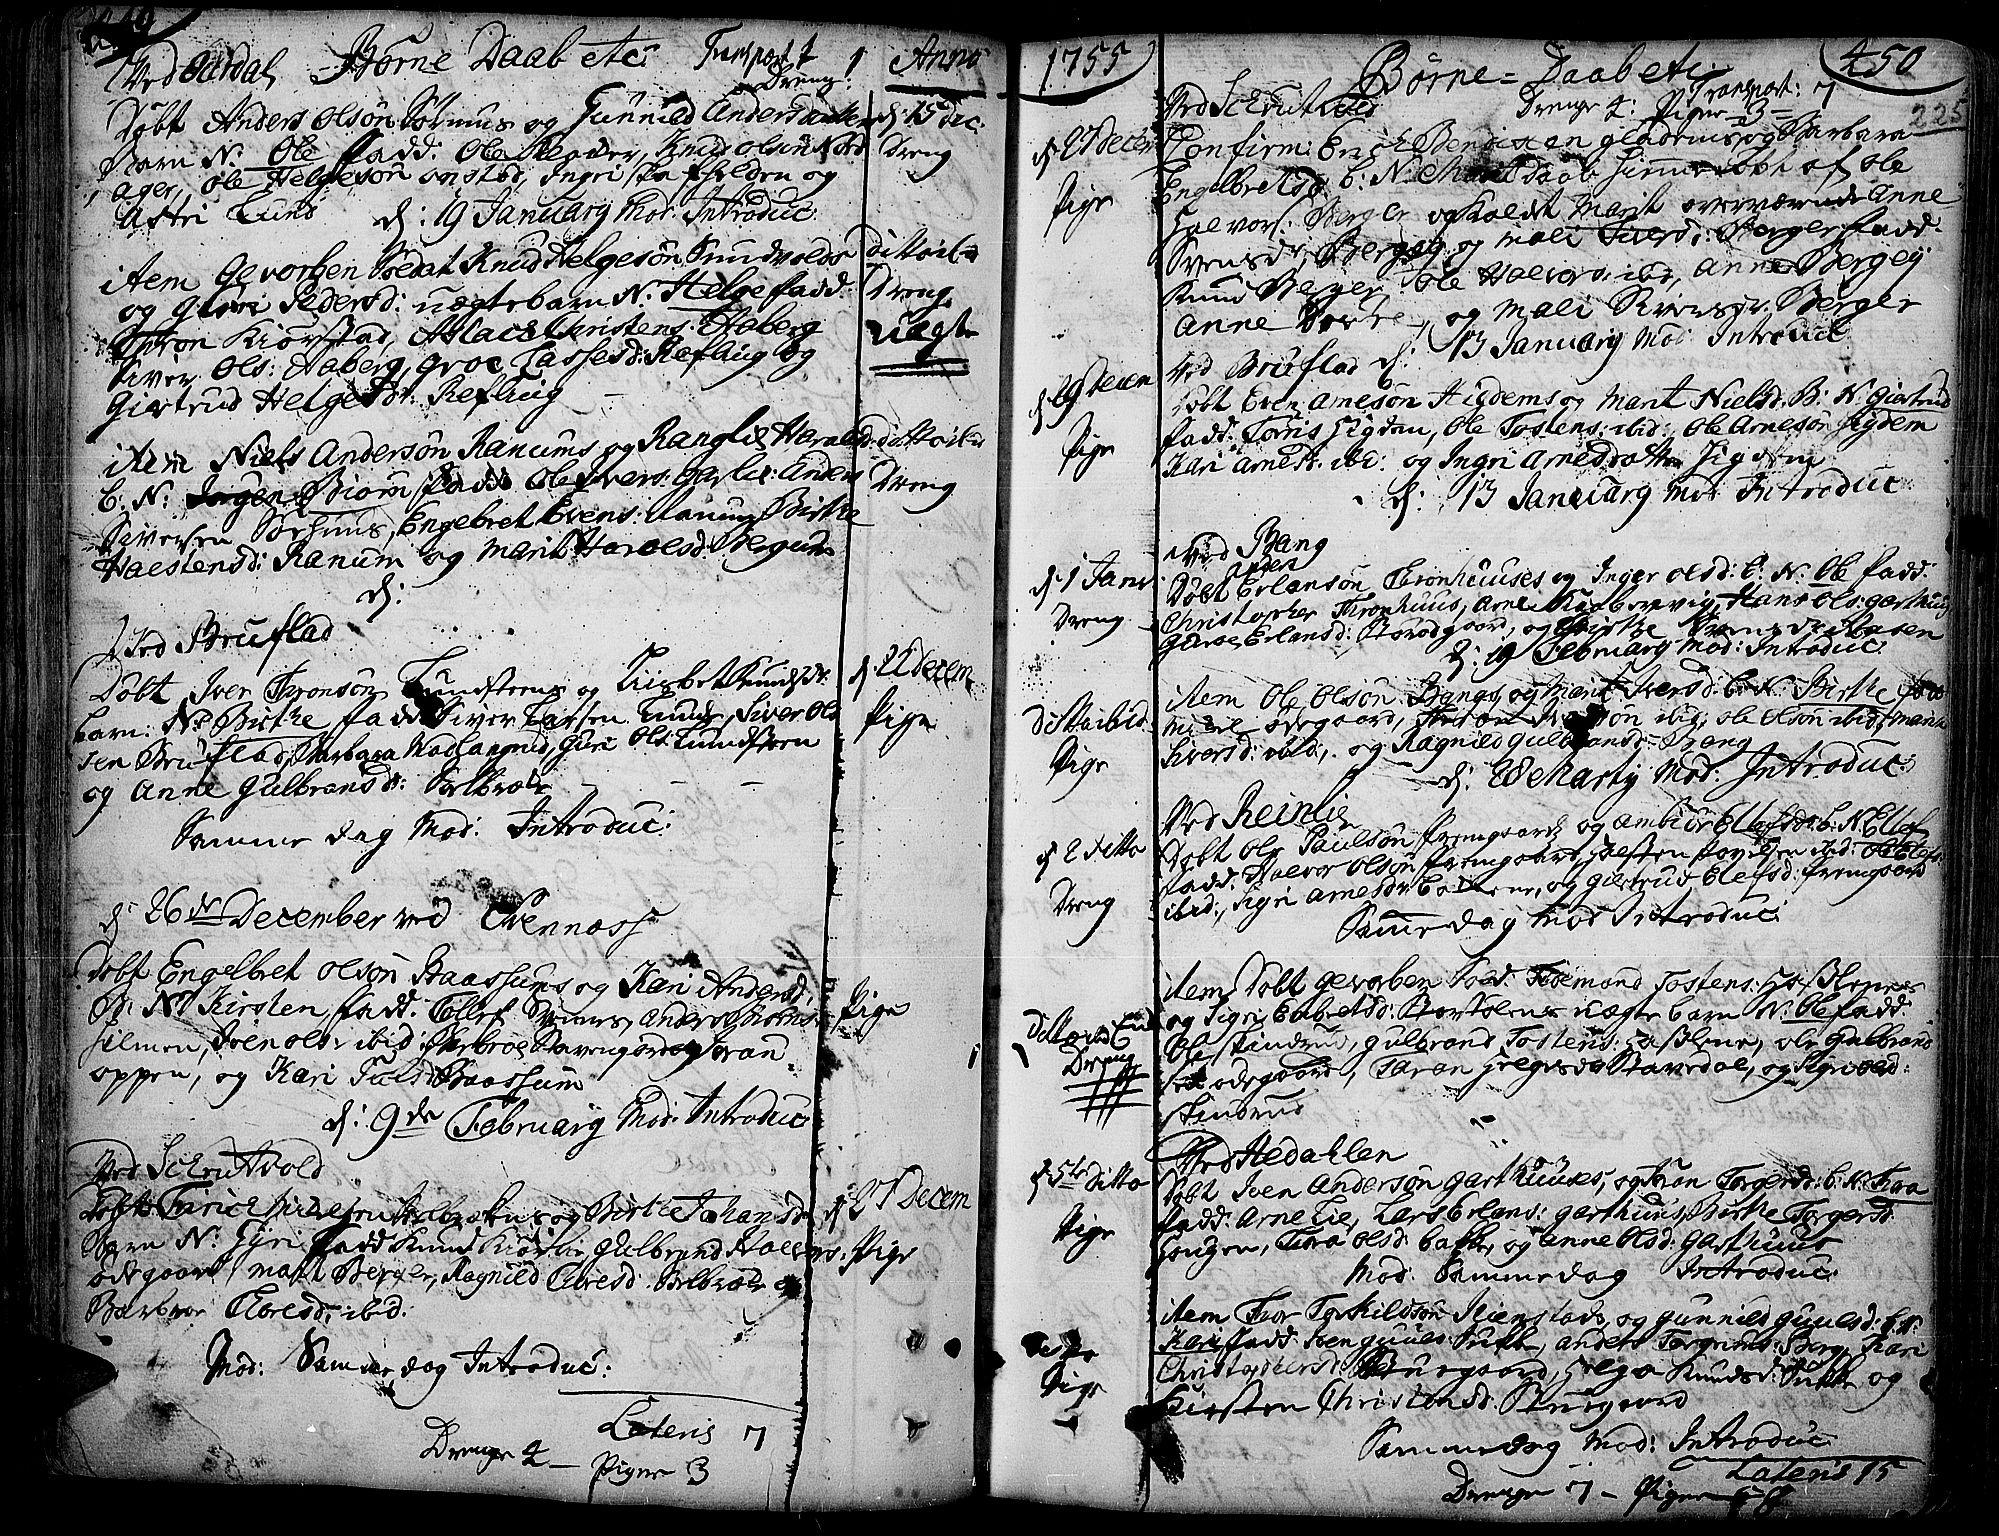 SAH, Aurdal prestekontor, Ministerialbok nr. 4, 1730-1762, s. 449-450